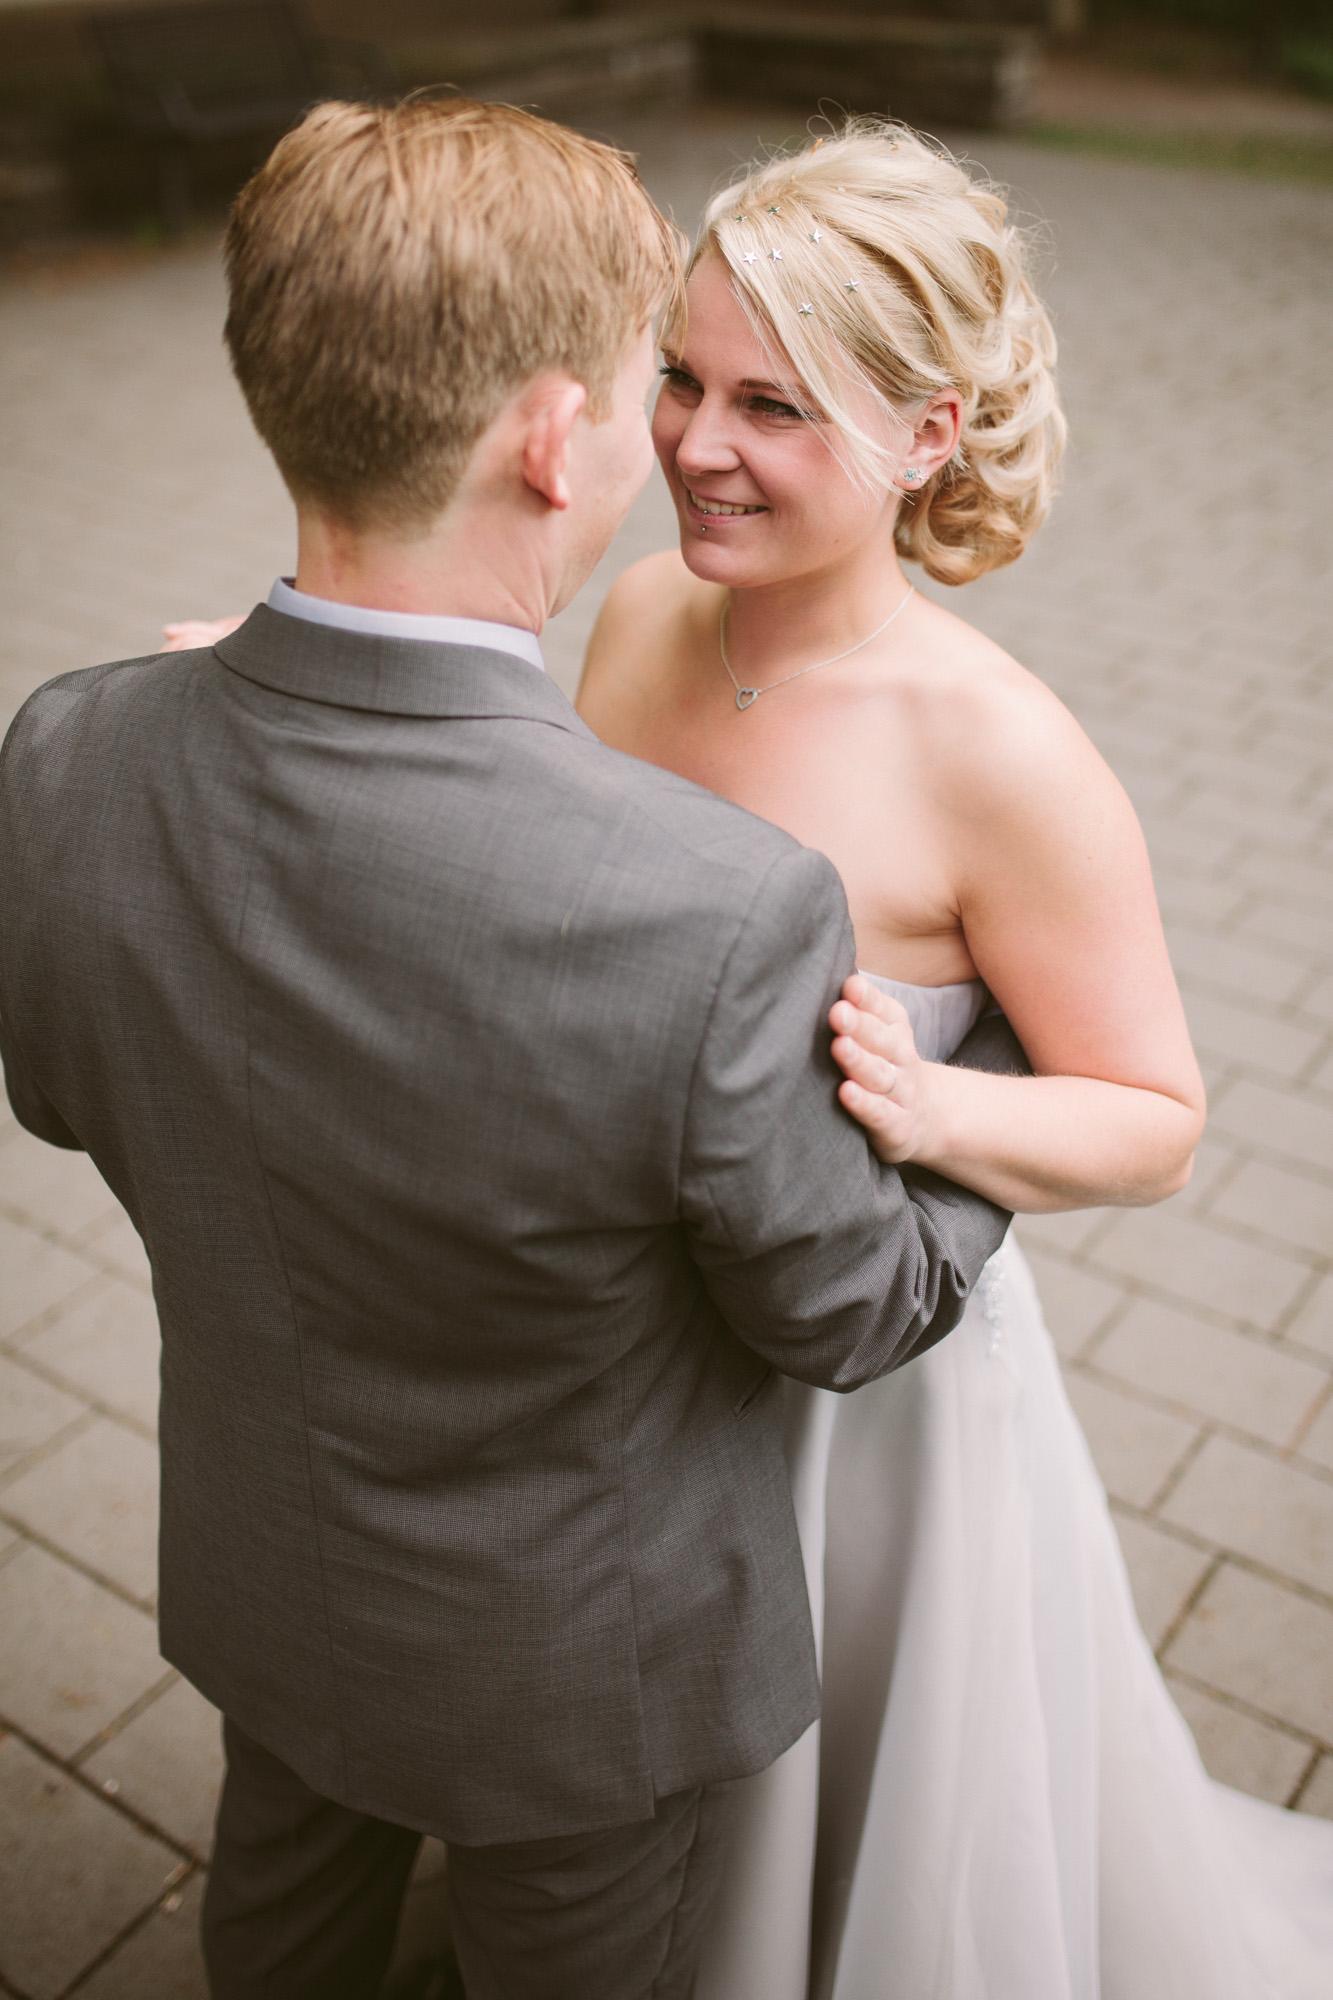 Claudia-Krawinkel-Hochzeitsfotografie-Essen-Duisburg-Standesamt-Schloss-Borbeck-51